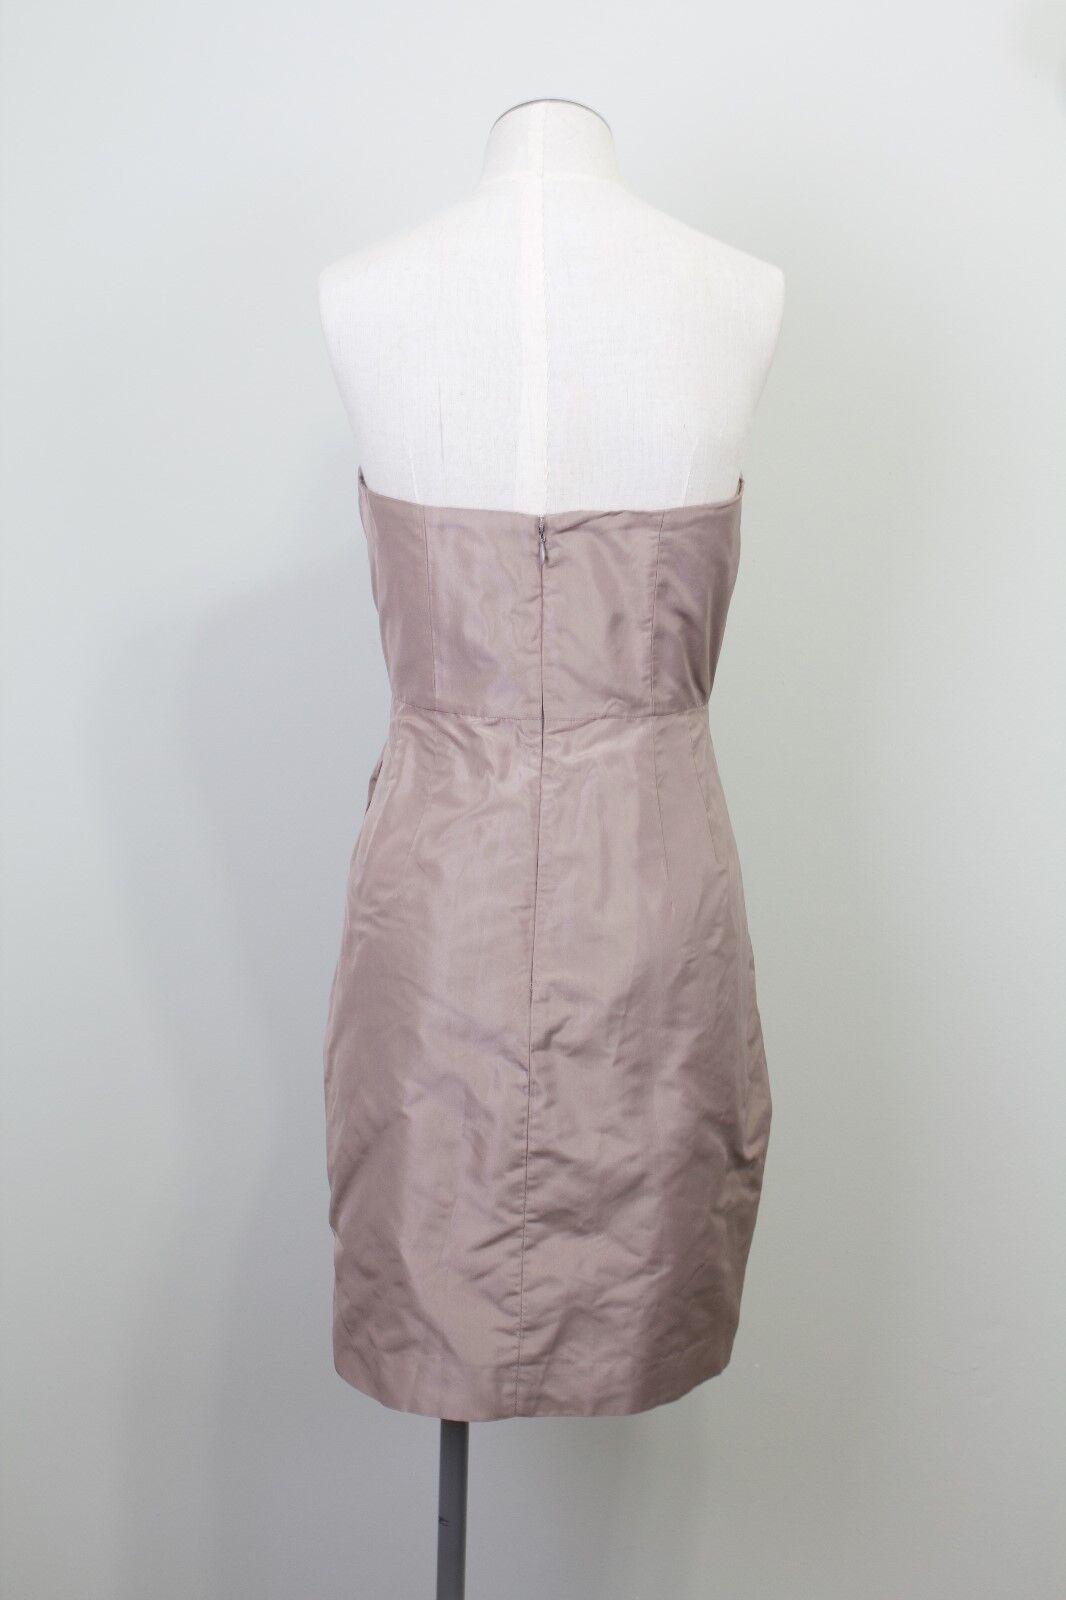 JCrew Selma Dress in in in Silk Taffeta  Size 6 Item 29284 Retail  250 d11fa3